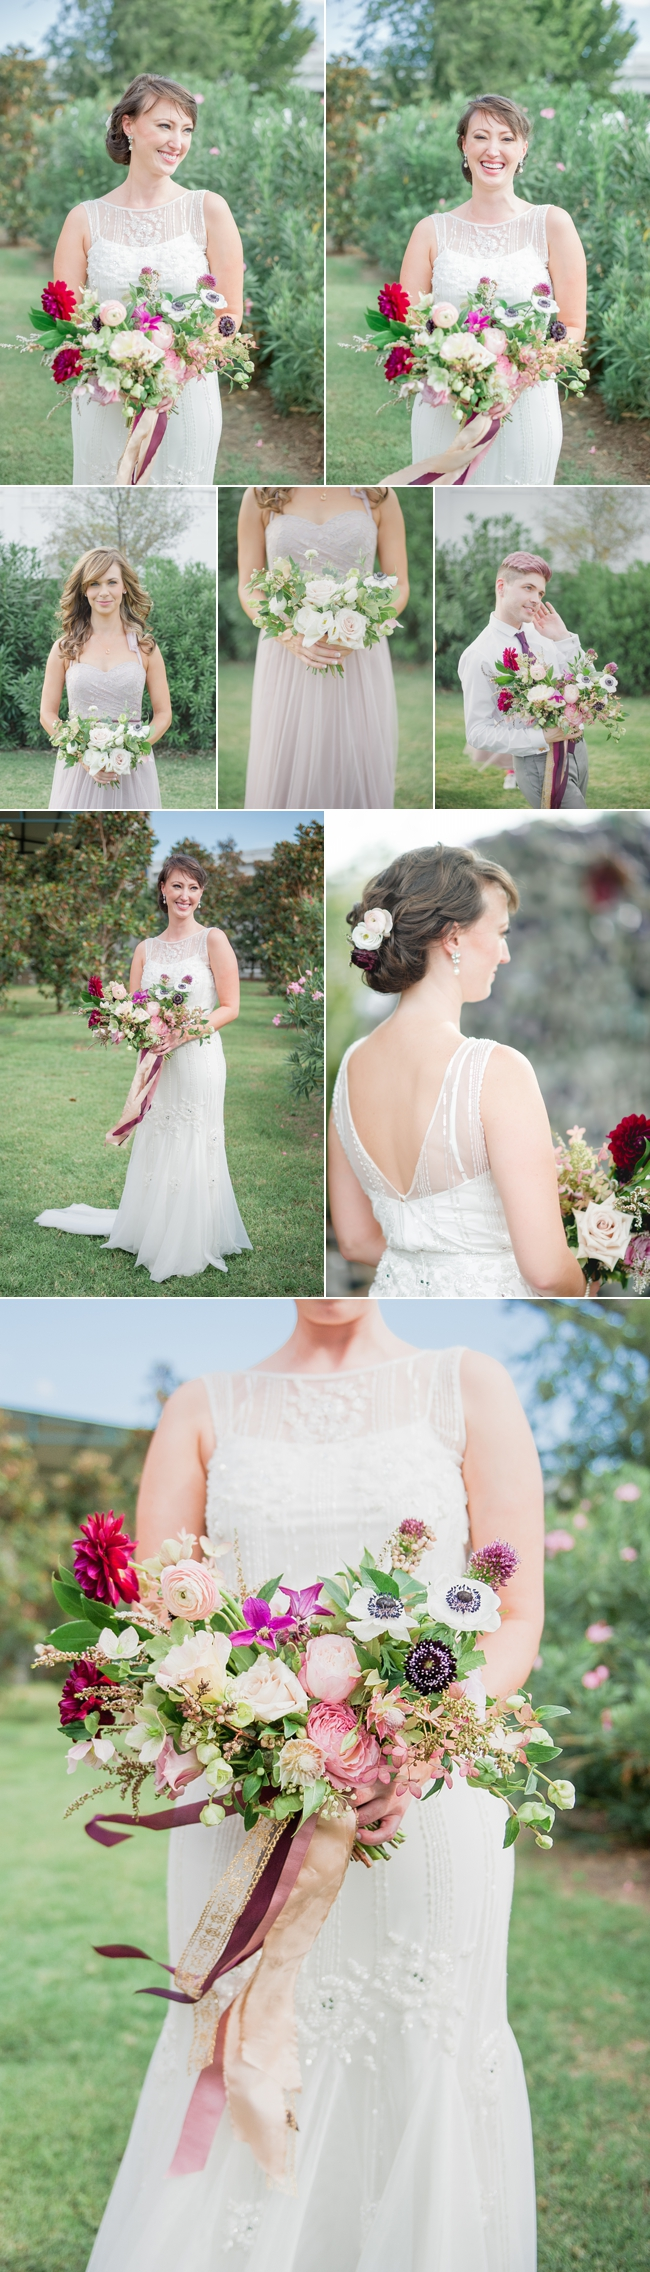 Best Dallas Wedding Photographers